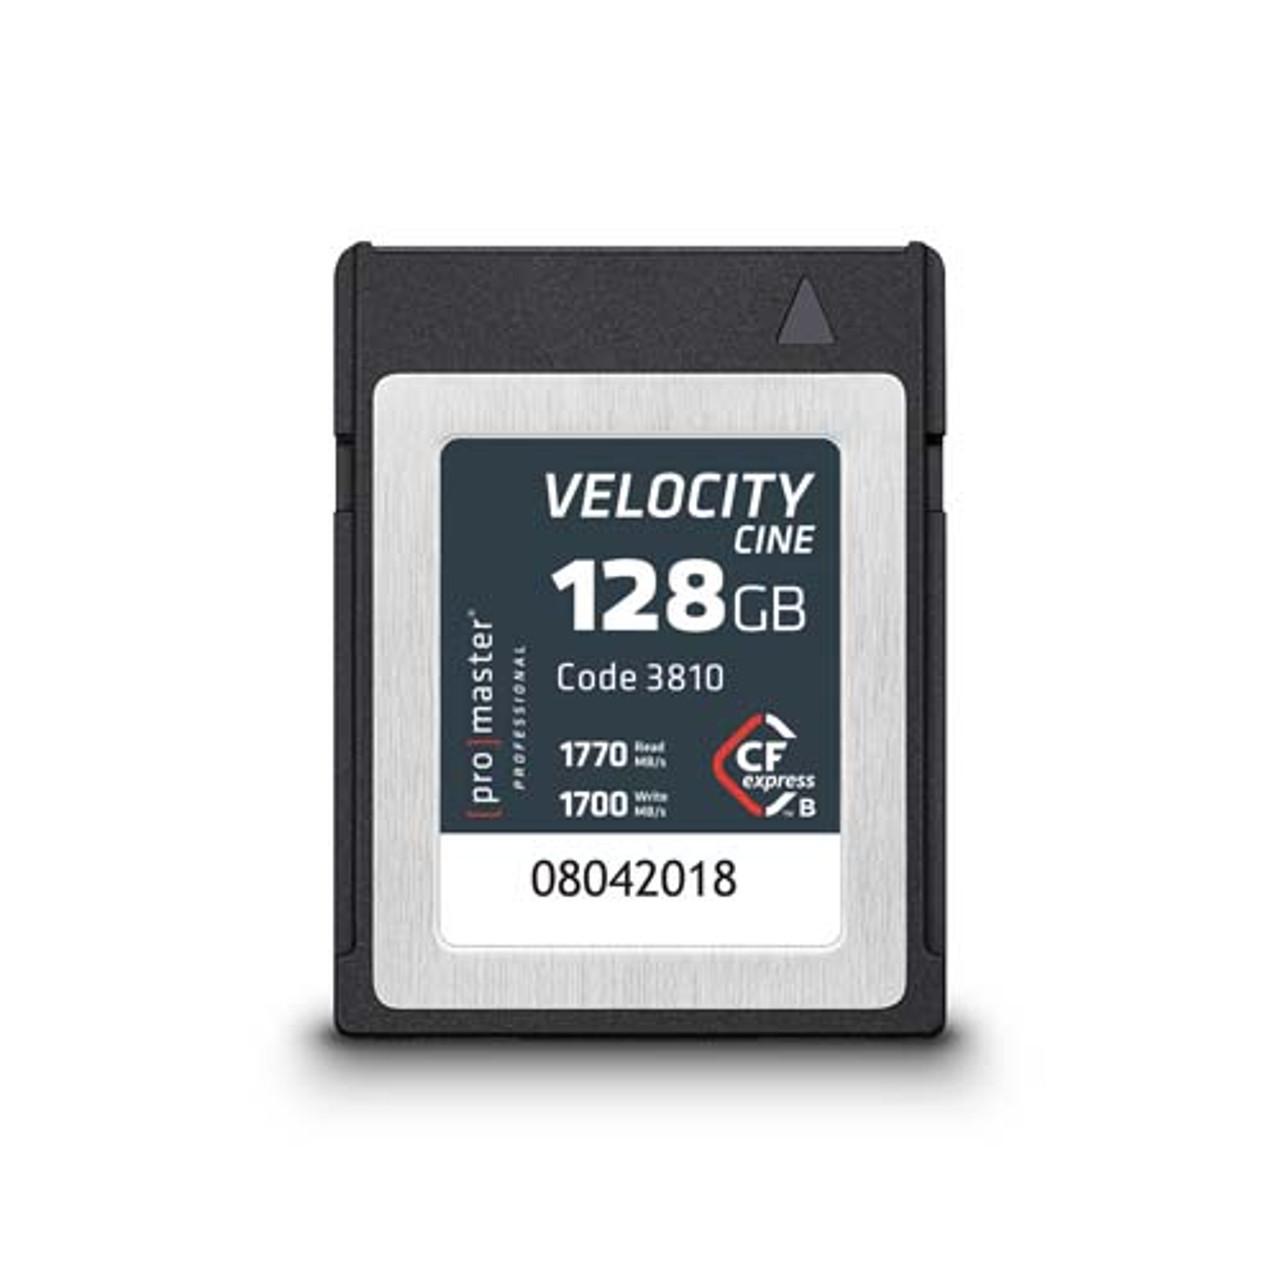 ProMaster CFexpress Type B 128GB Velocity Cine Card